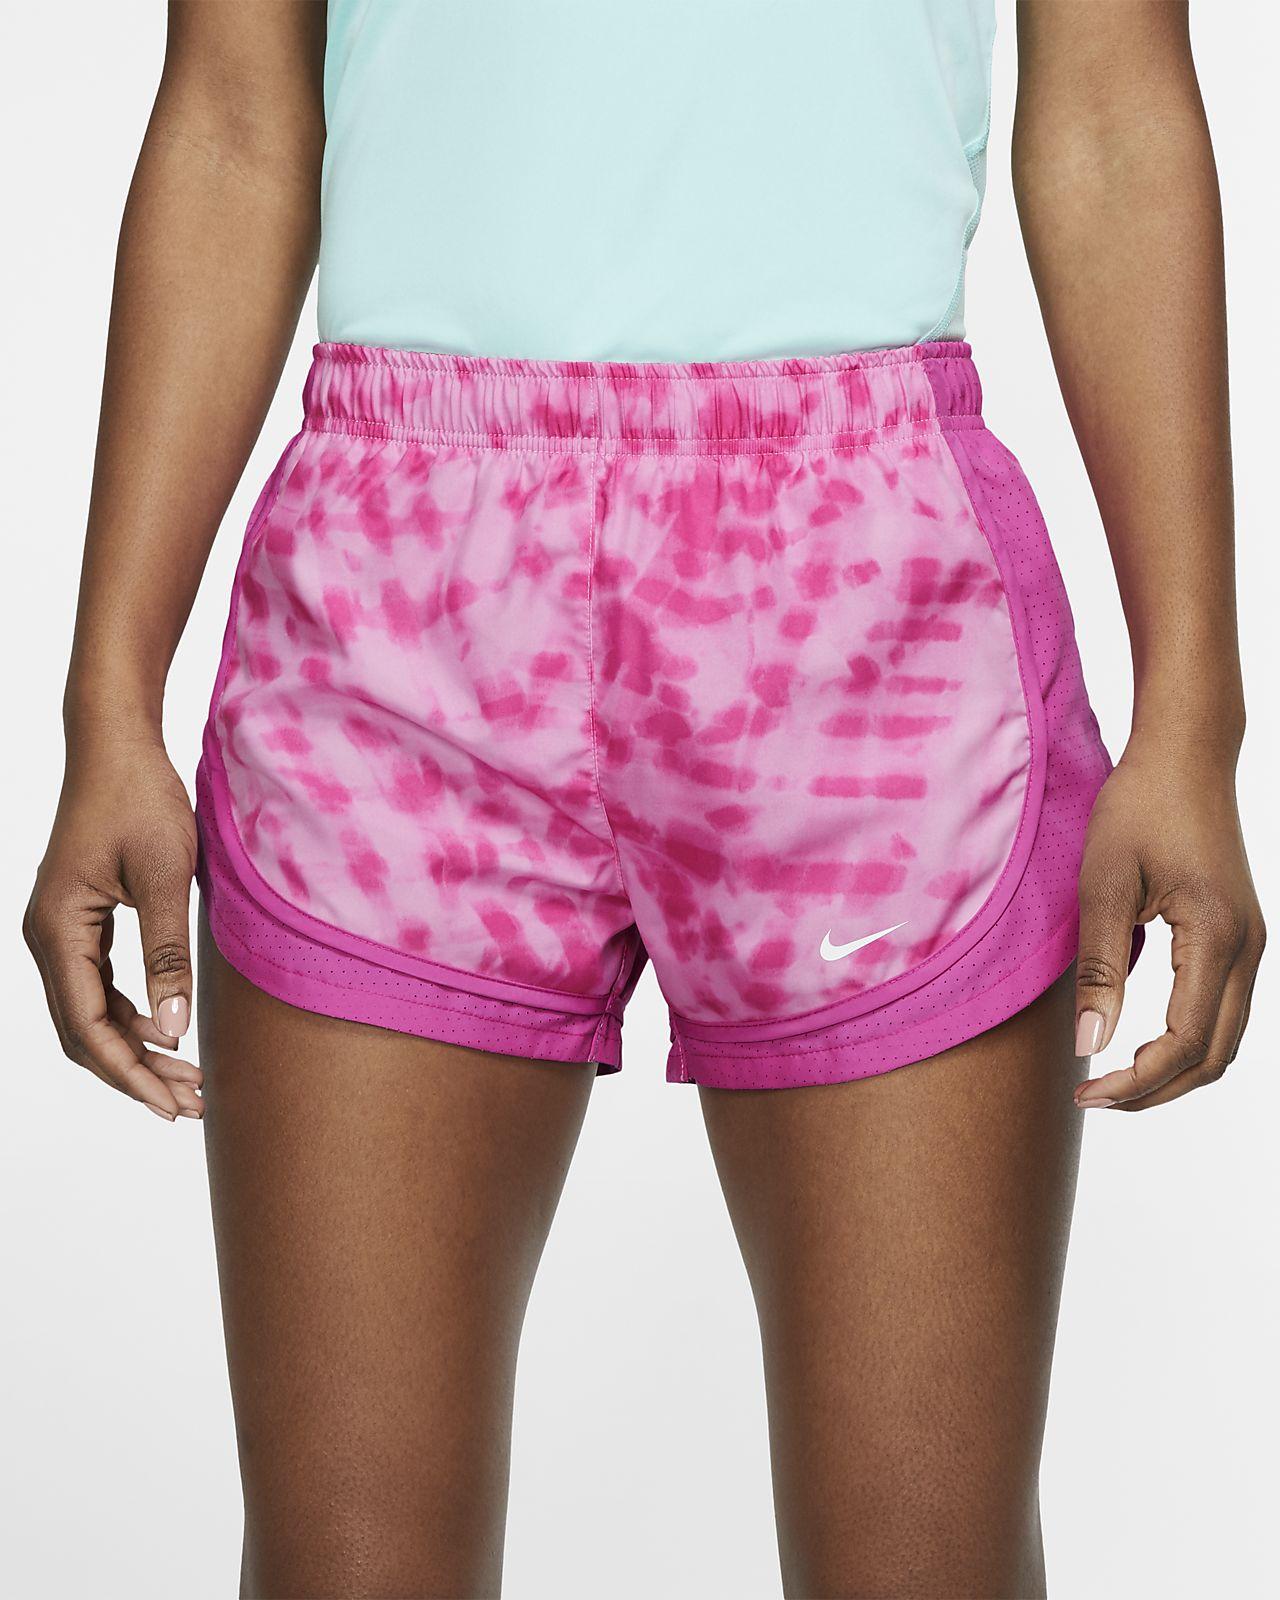 0379199d98e2 Nike Tempo Women's Printed Running Shorts. Nike.com